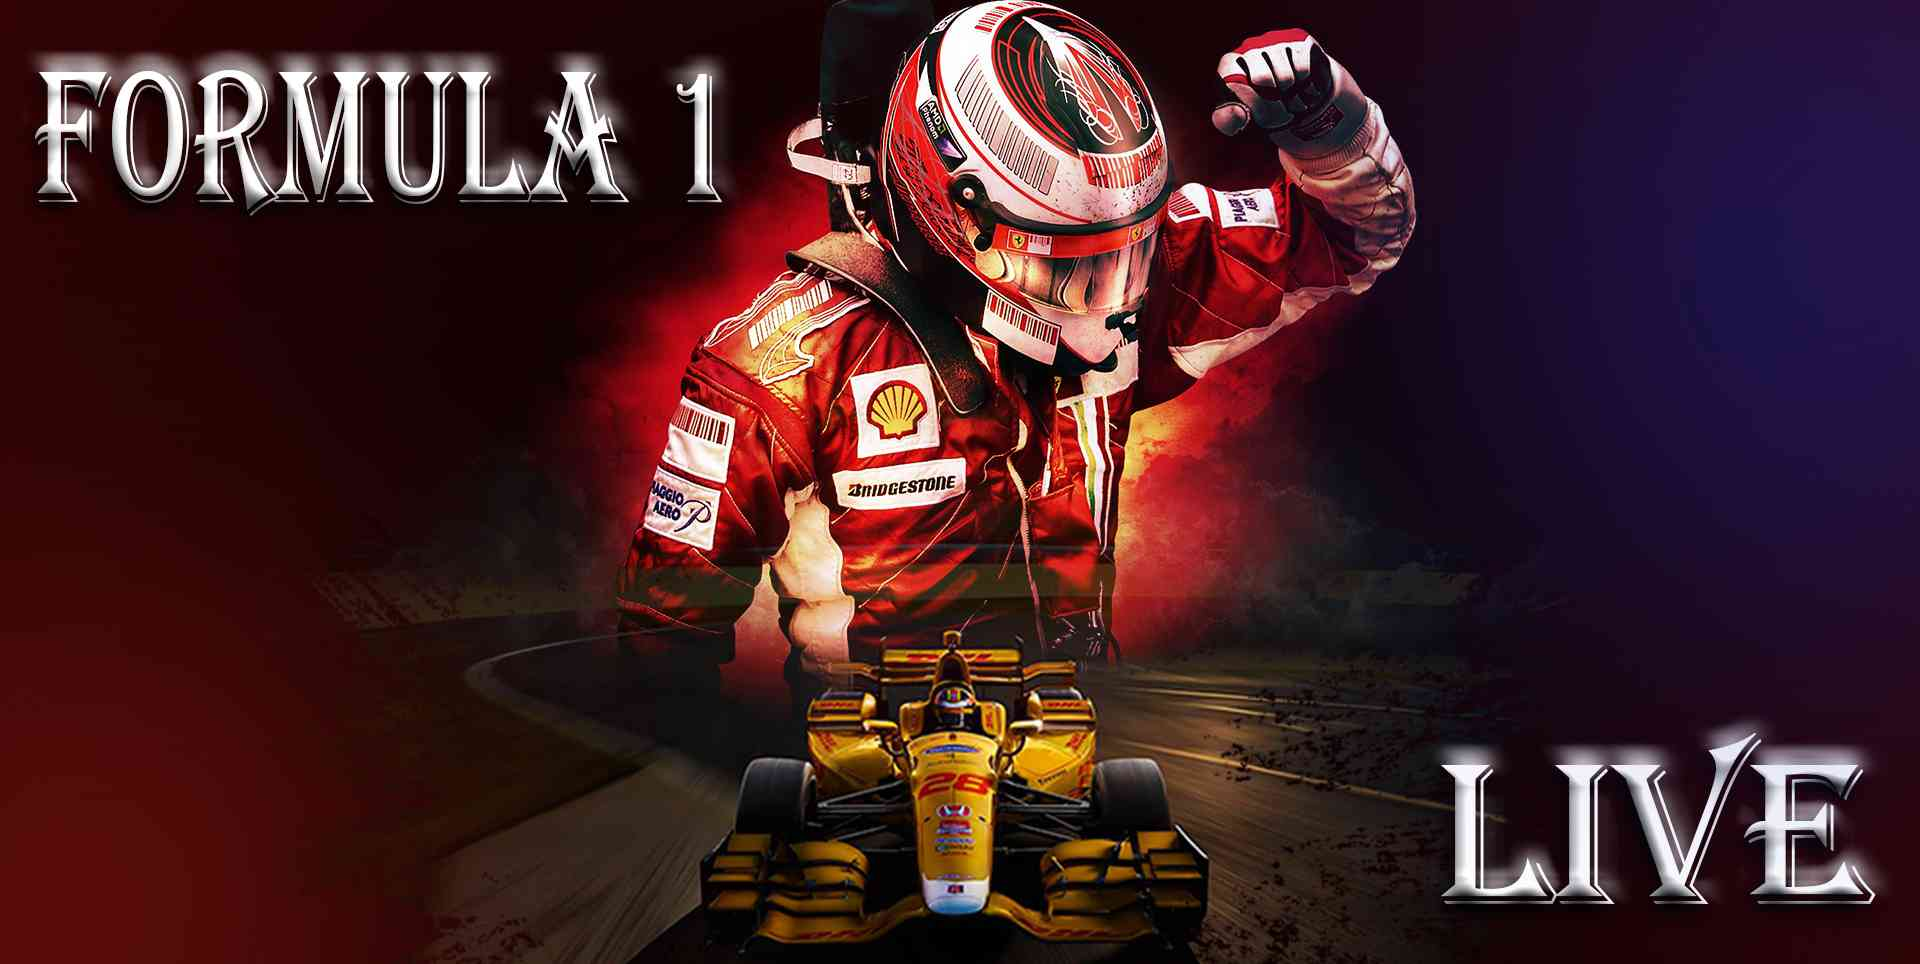 2016-fia-formula-e-championship-usa-live